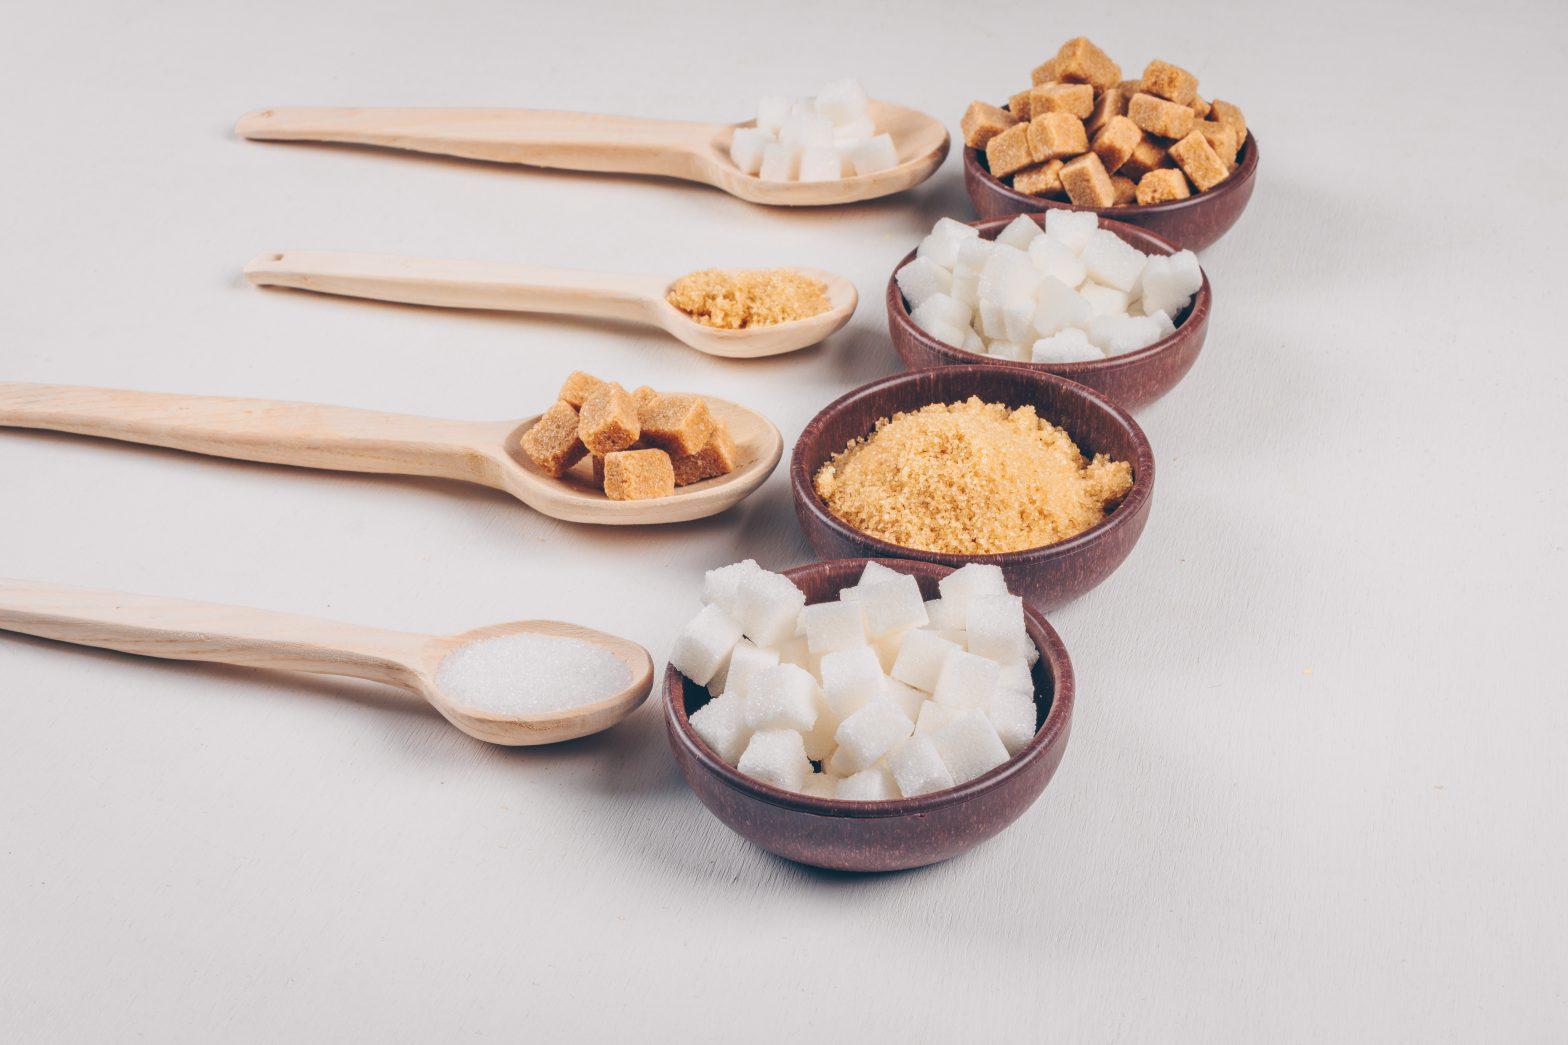 restricao-alimentar-8-substitutos-saudaveis-ao-acucar